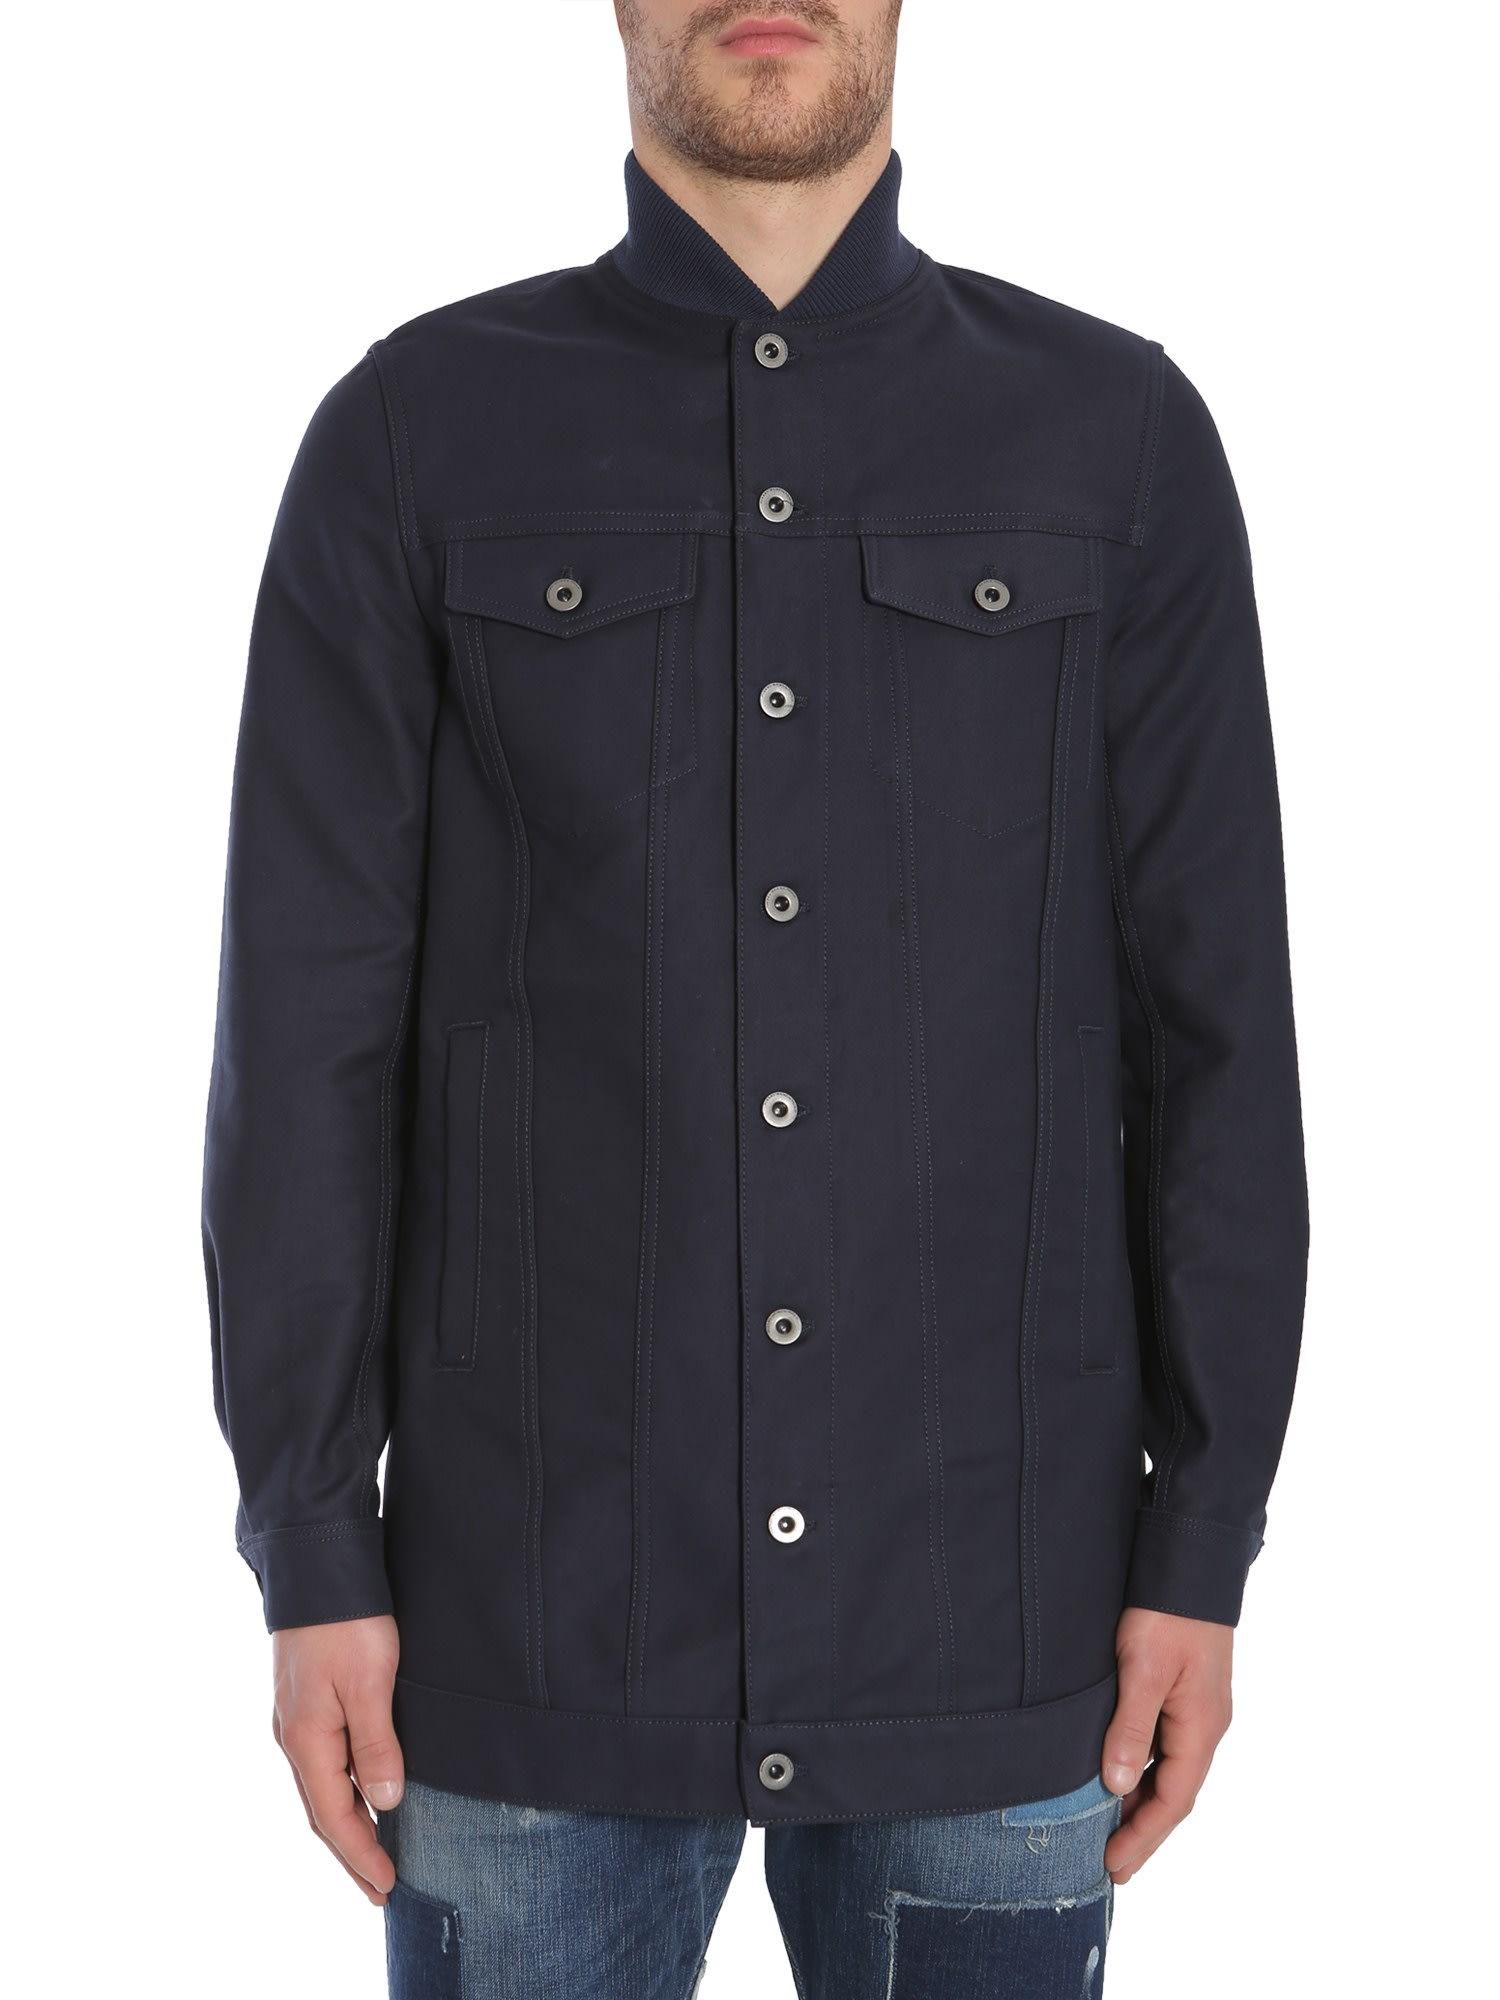 Johraly Safari Jacket